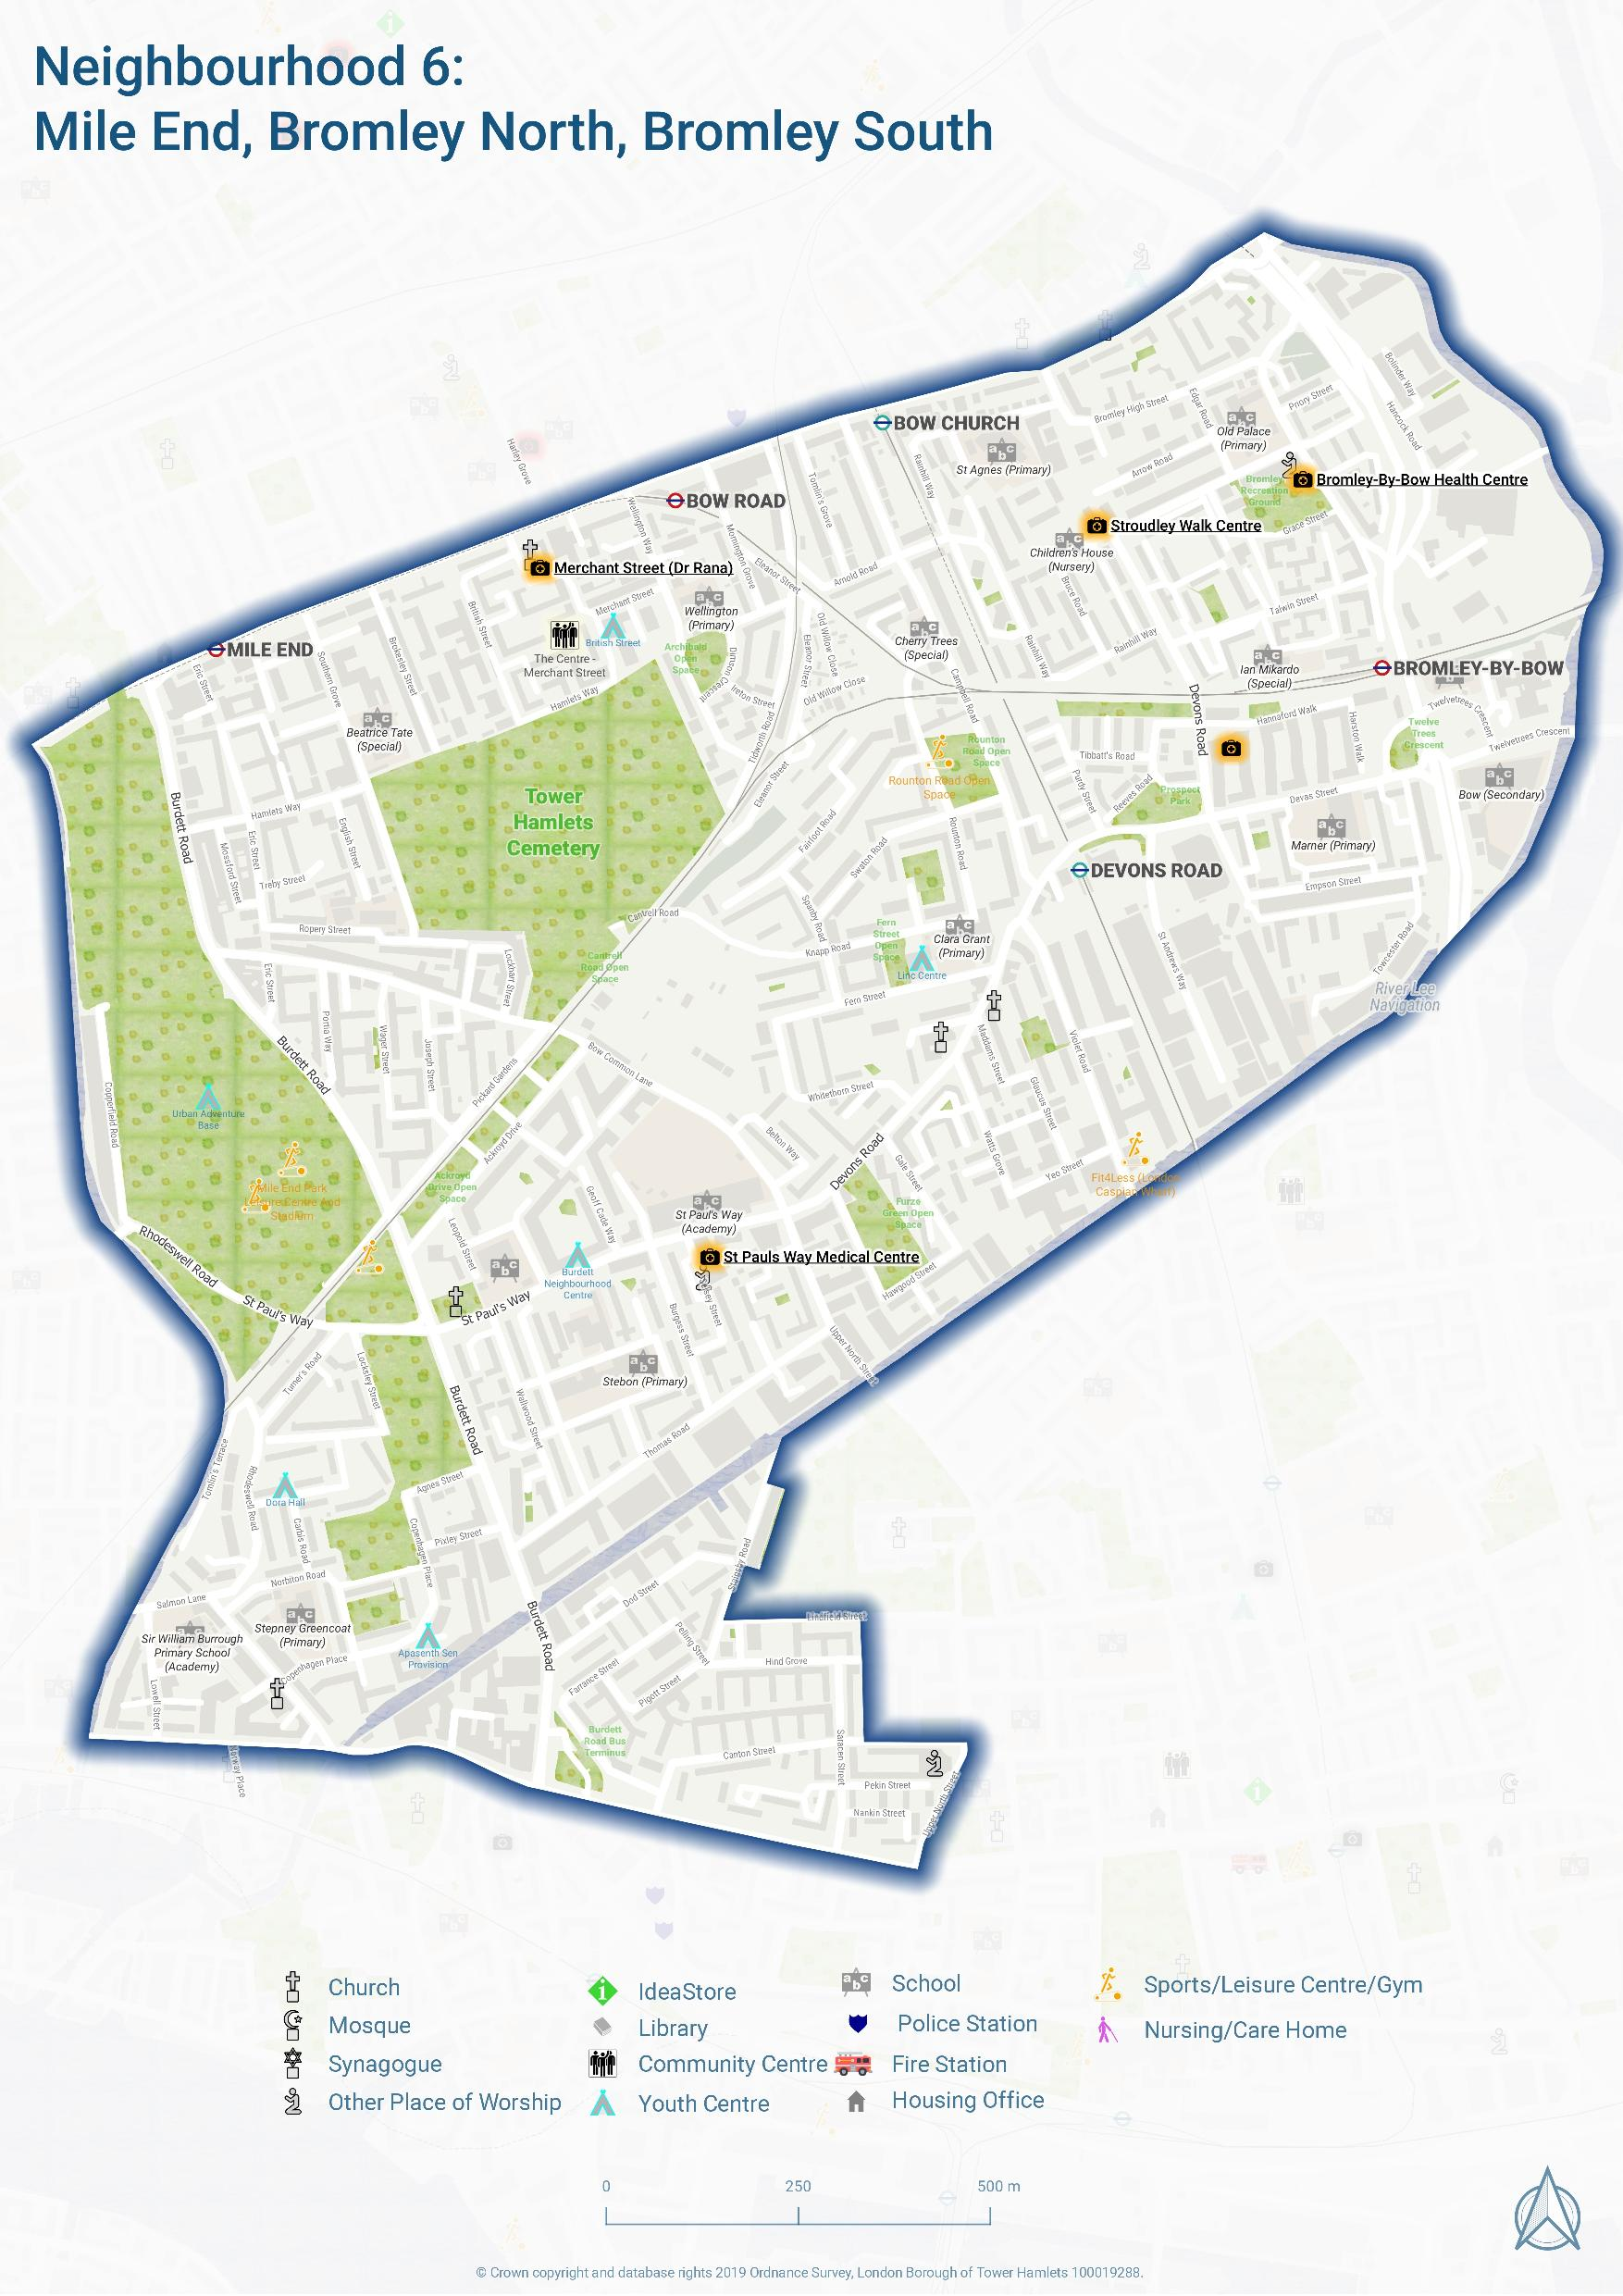 Mile End, Bromley N, Bromley S